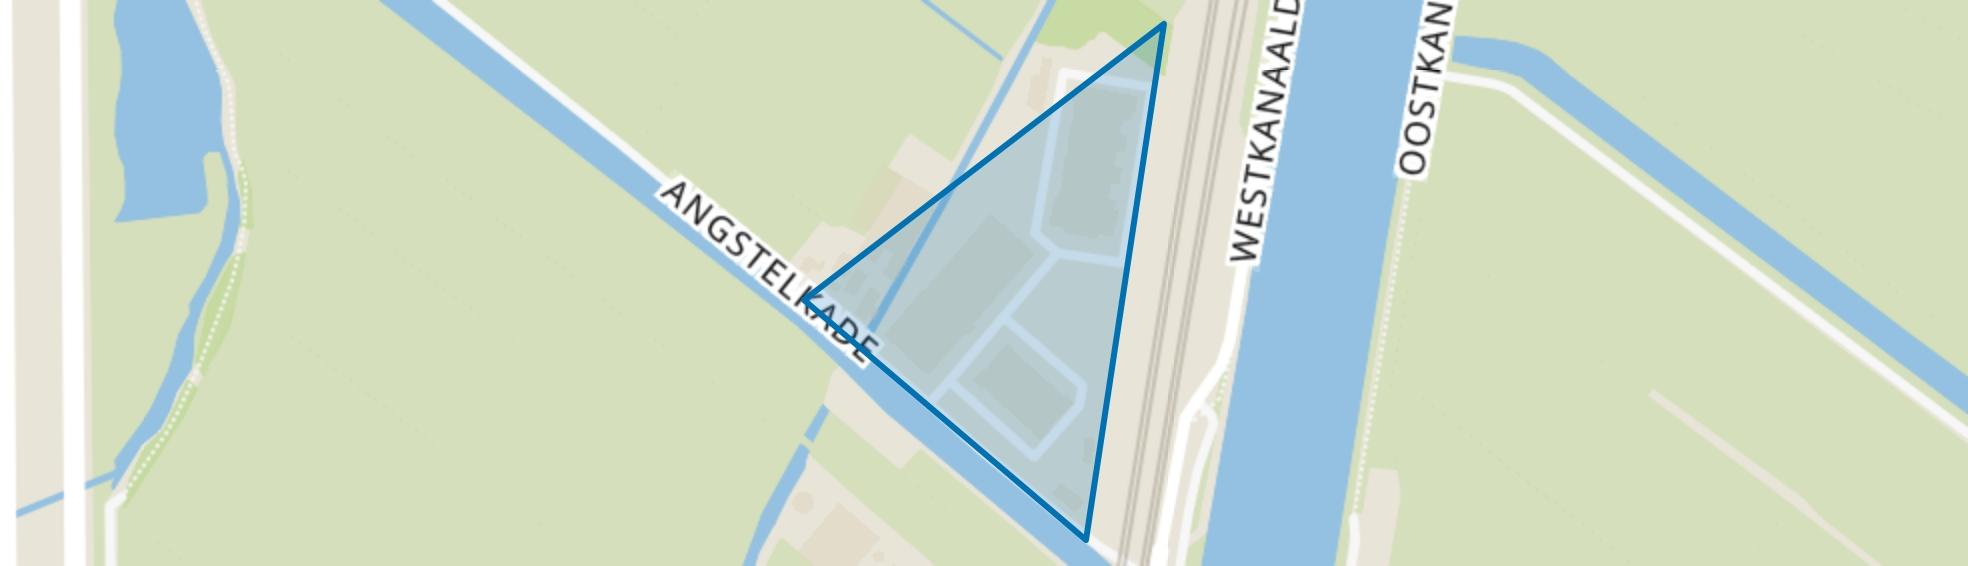 Angstelkade, Nieuwersluis map